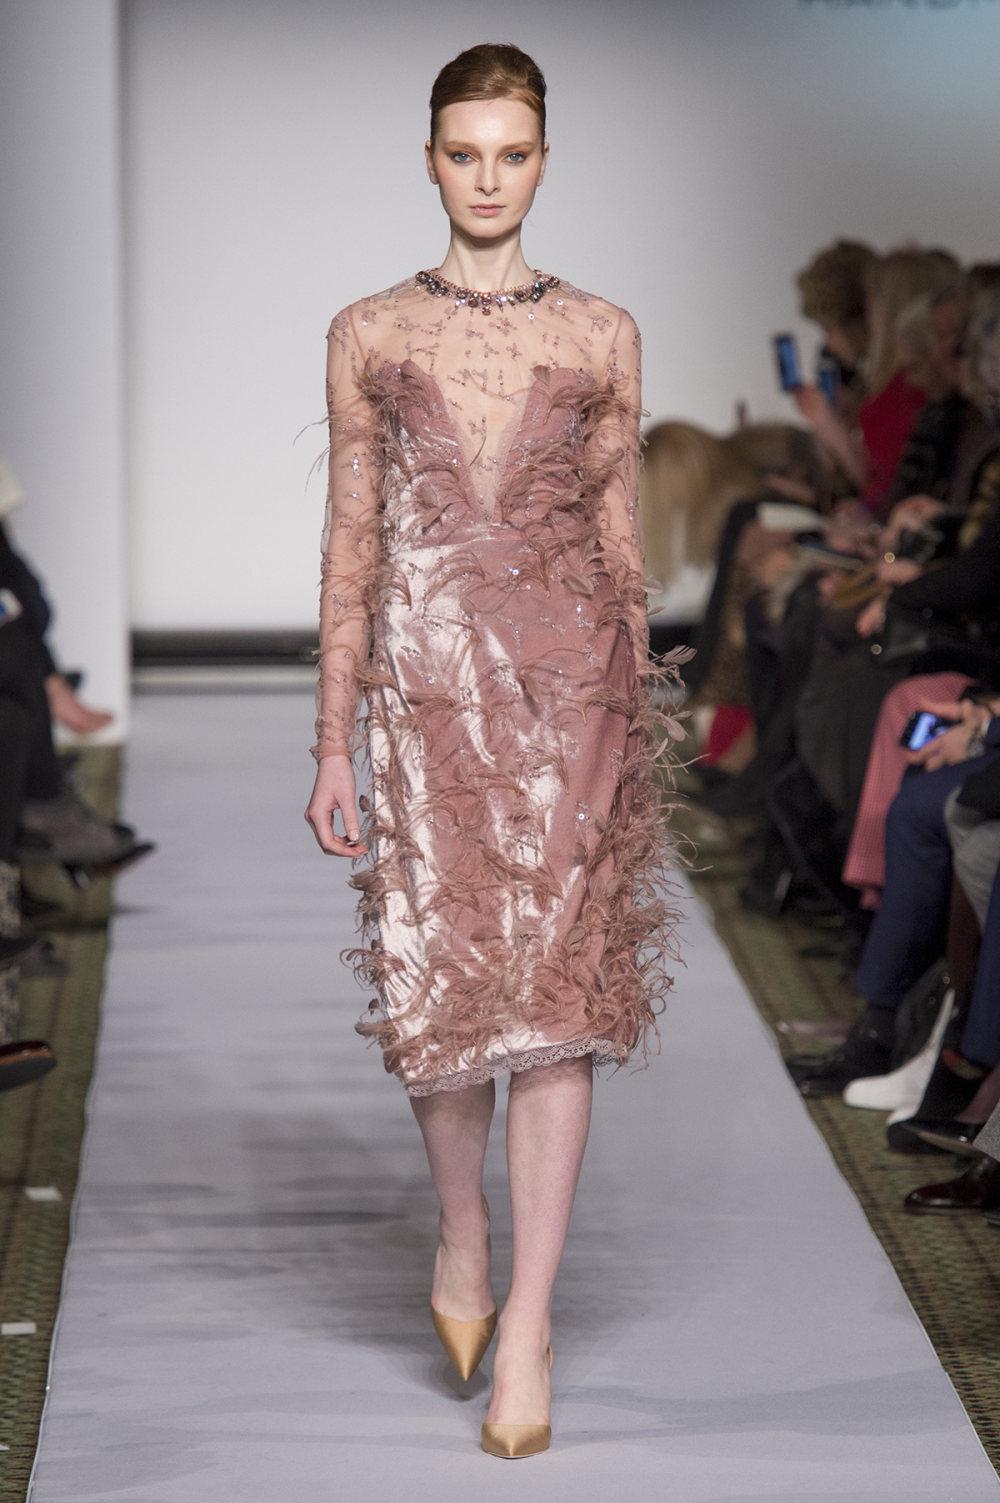 Carolina Herrera时装系列用鲜艳的颜色充满智能的黑白色调-46.jpg